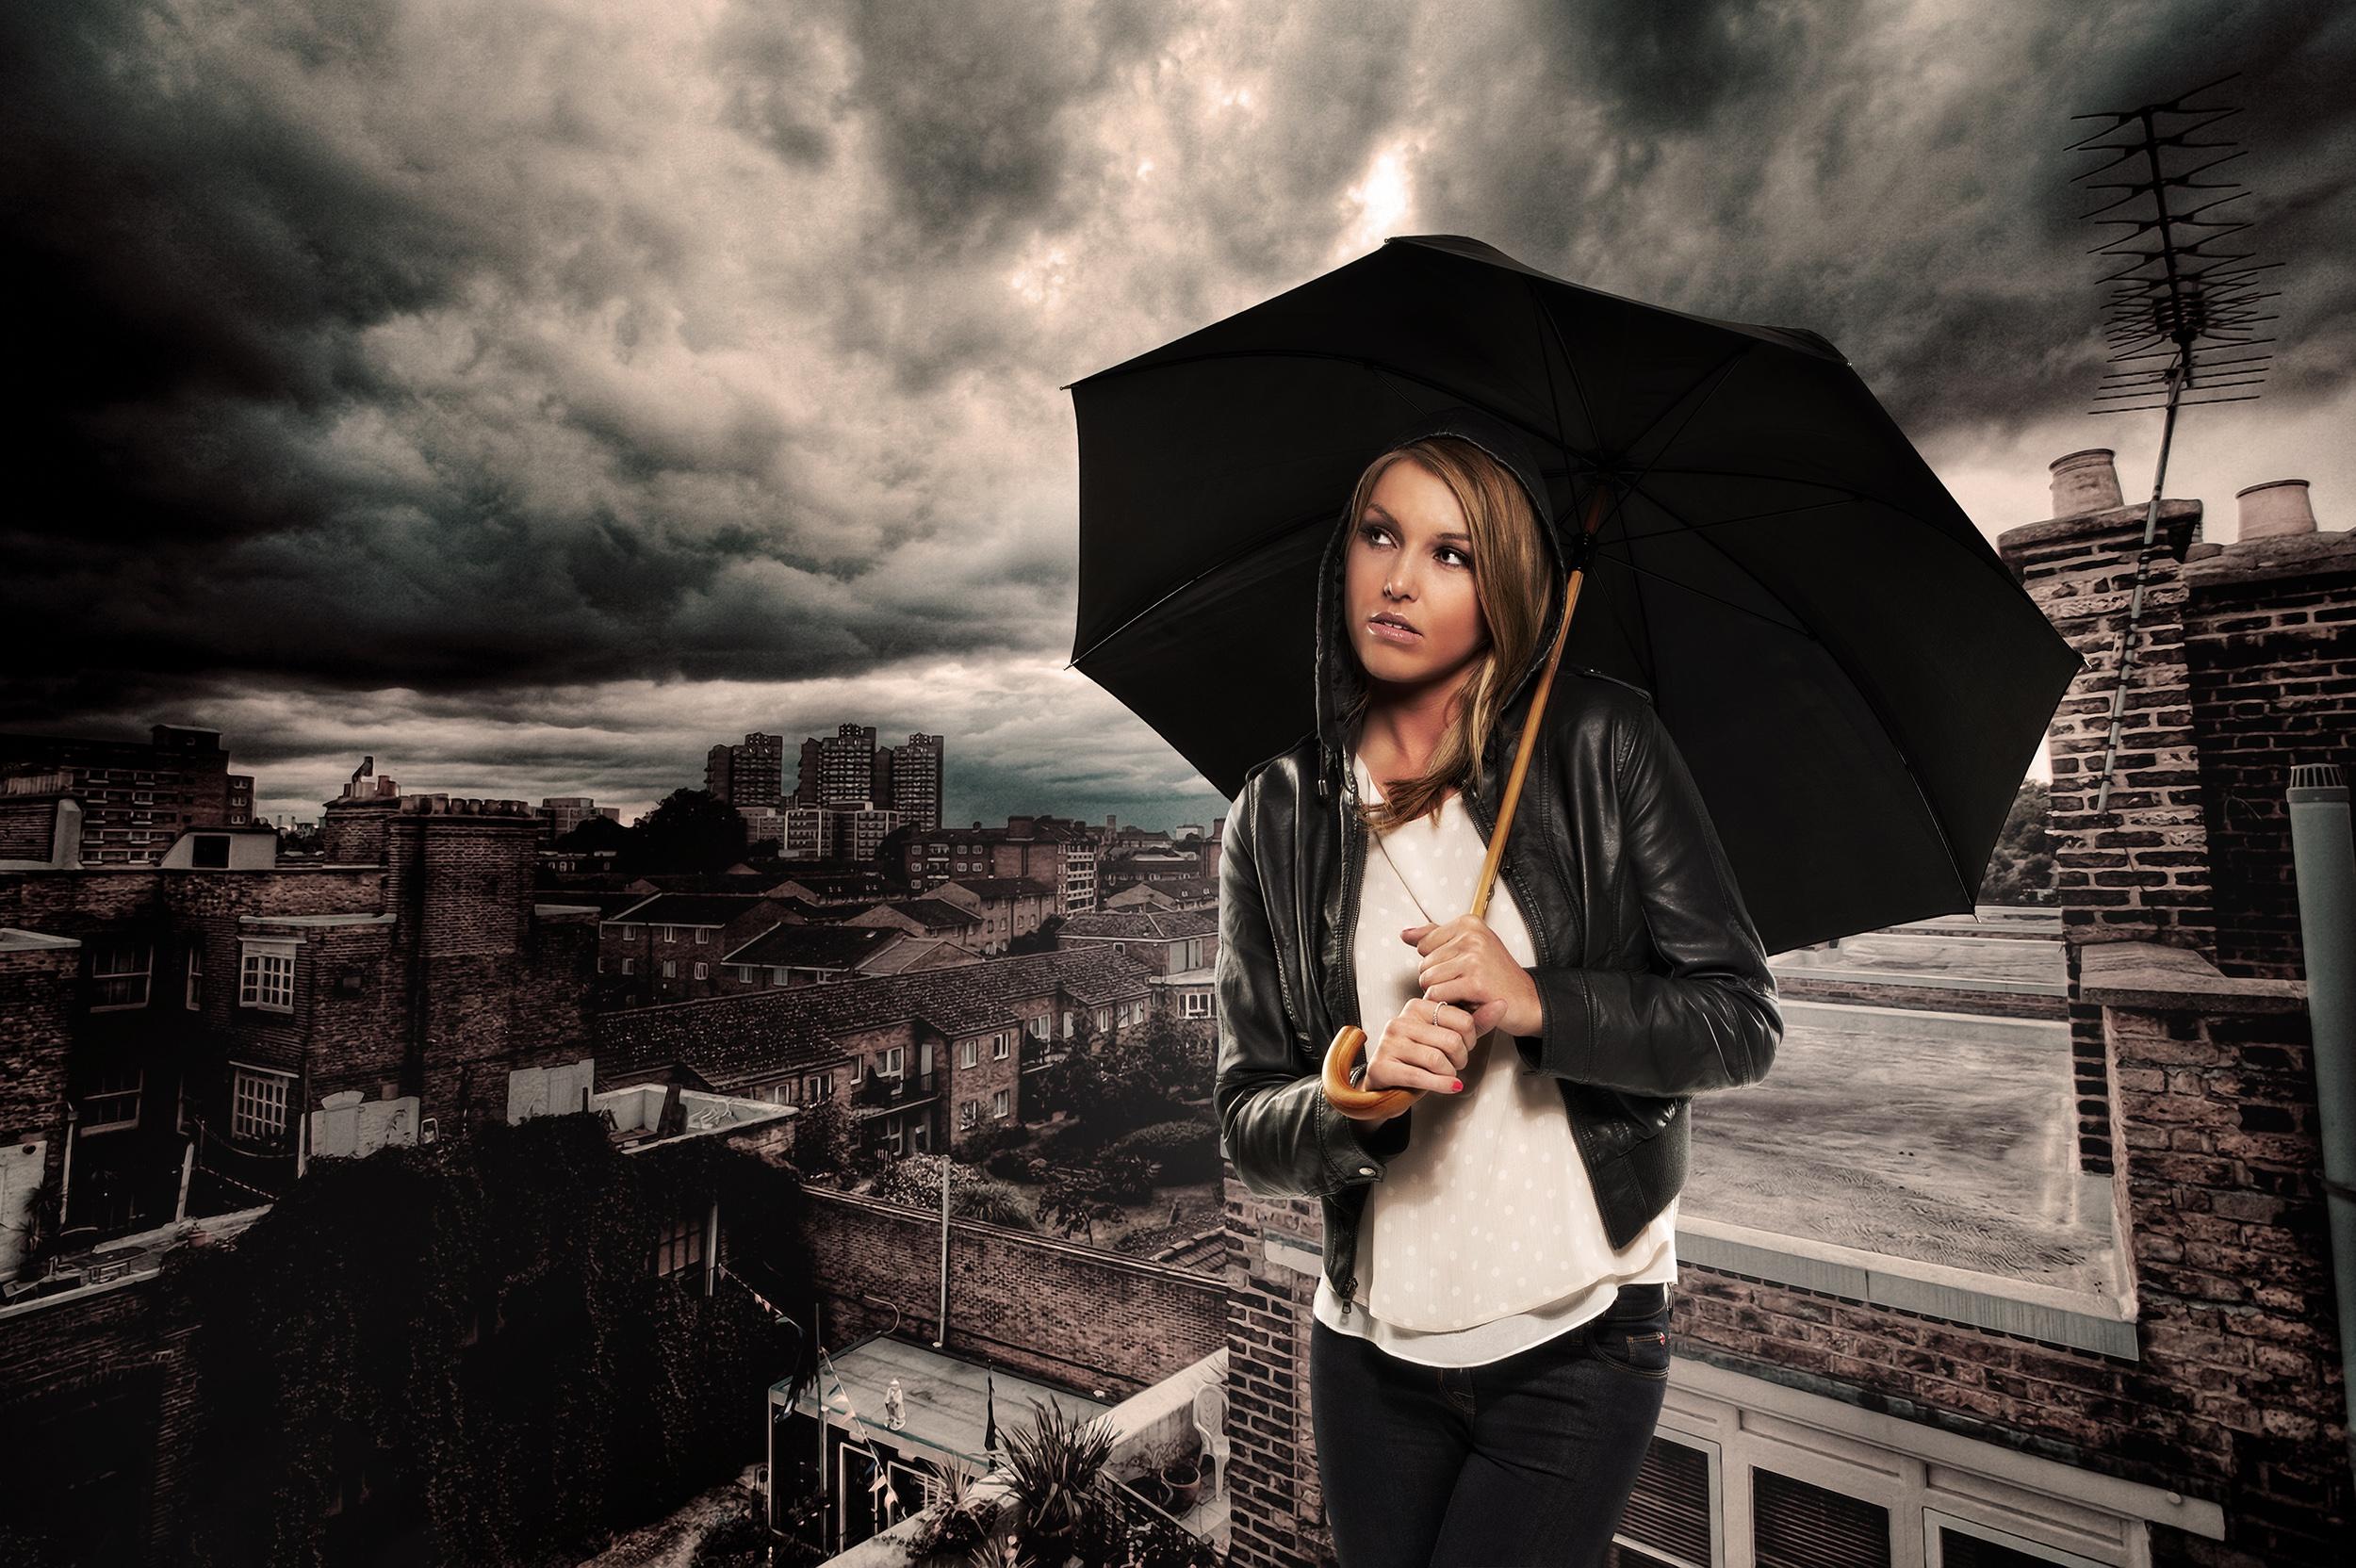 Danielle_Umbrella.jpg